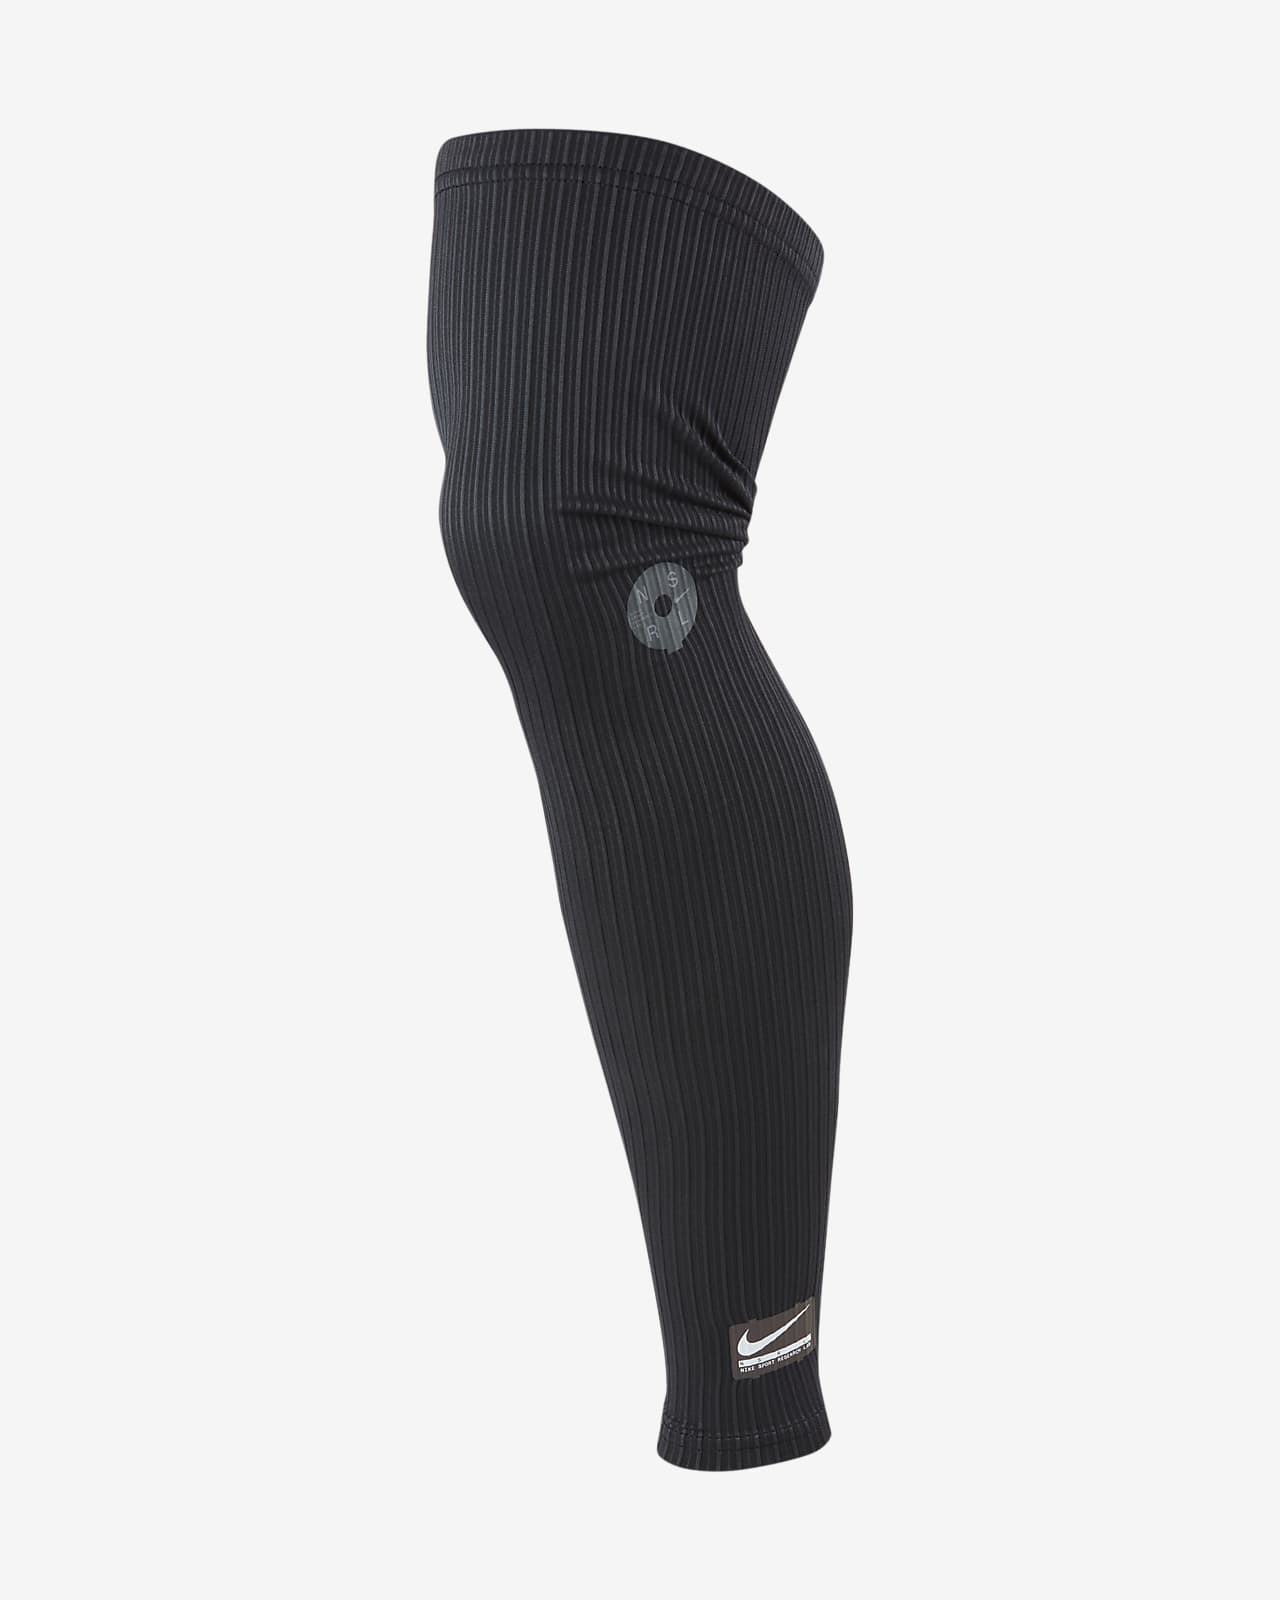 Nike AeroSwift Women's Running Leg Sleeves